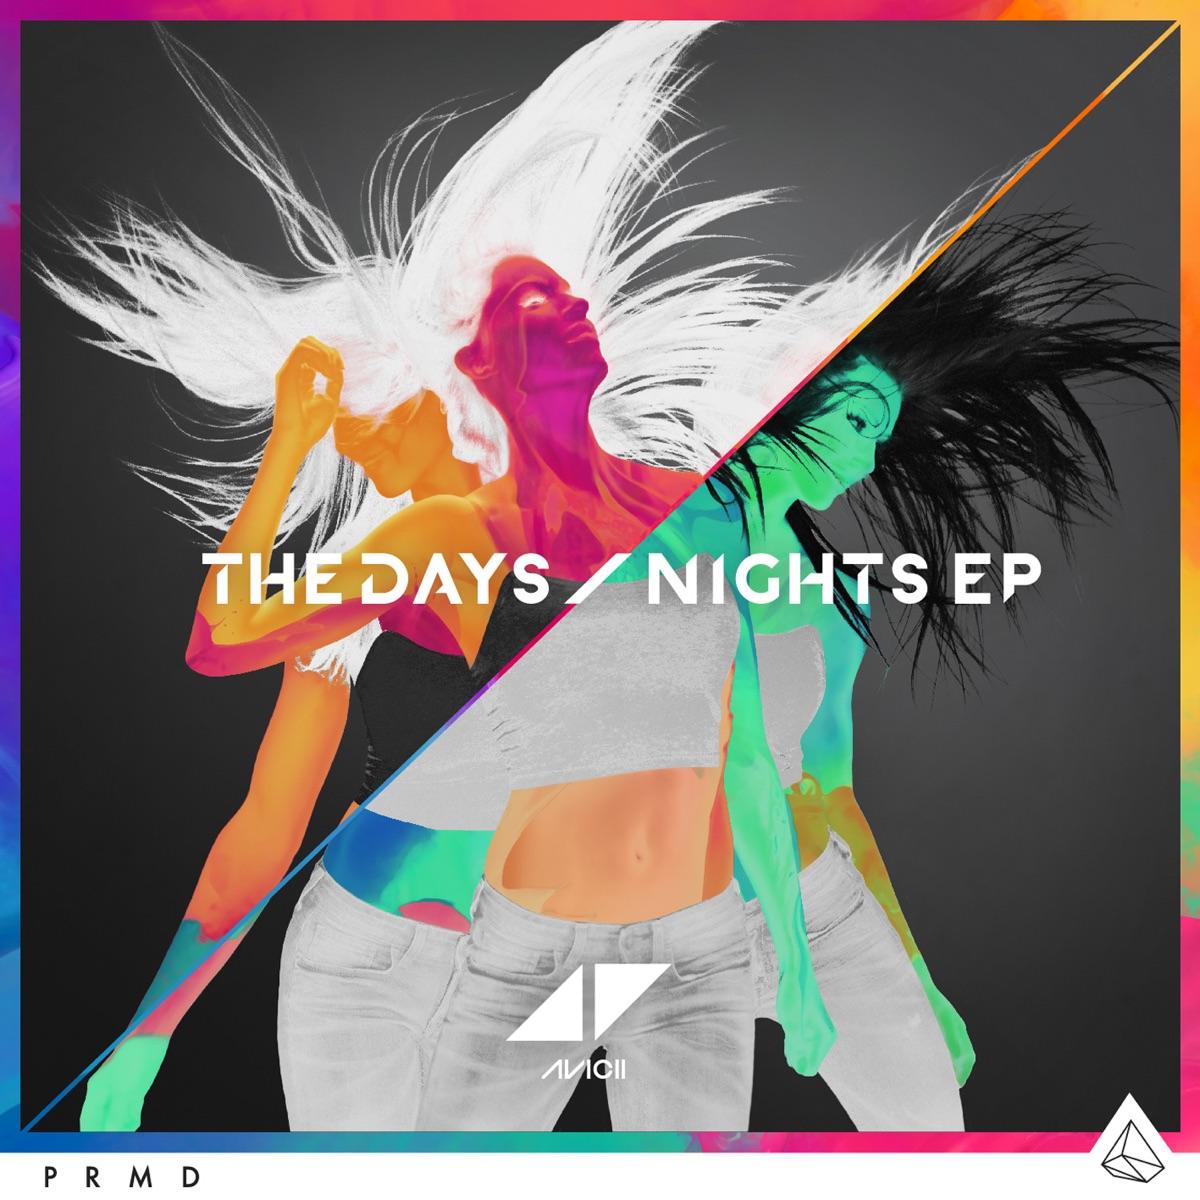 The DaysNights - EP Avicii CD cover